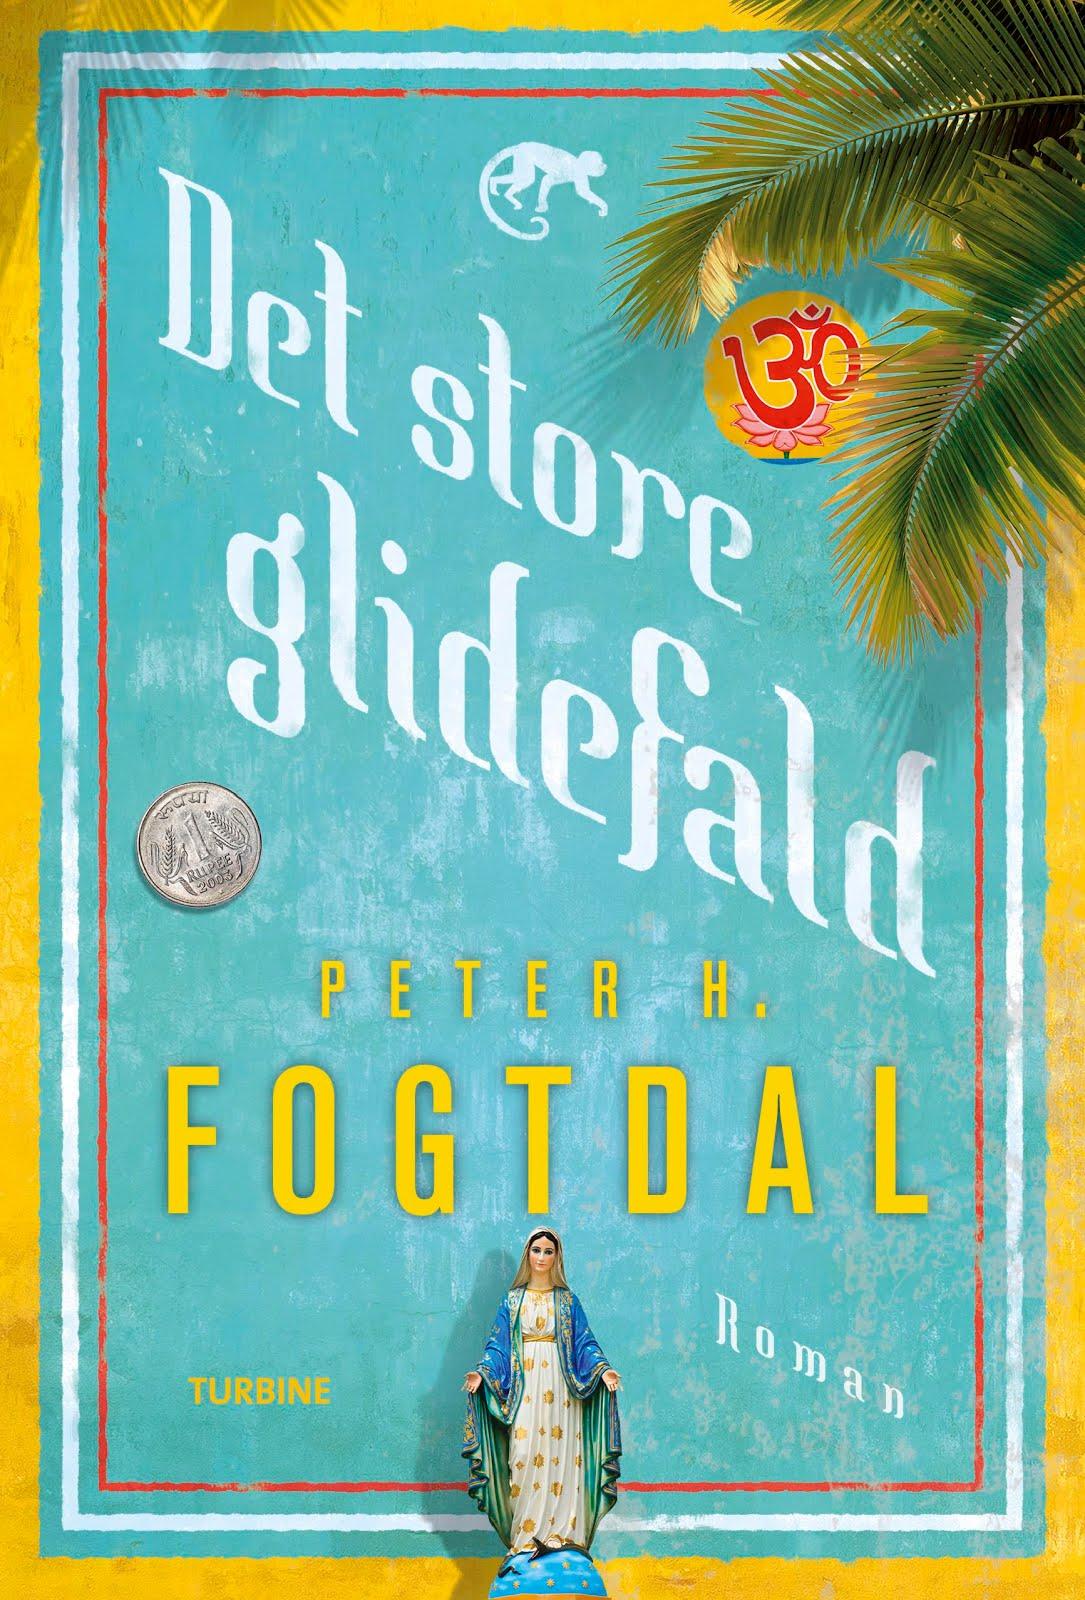 Ny roman d. 1.9.2017 -  Det store glidefald